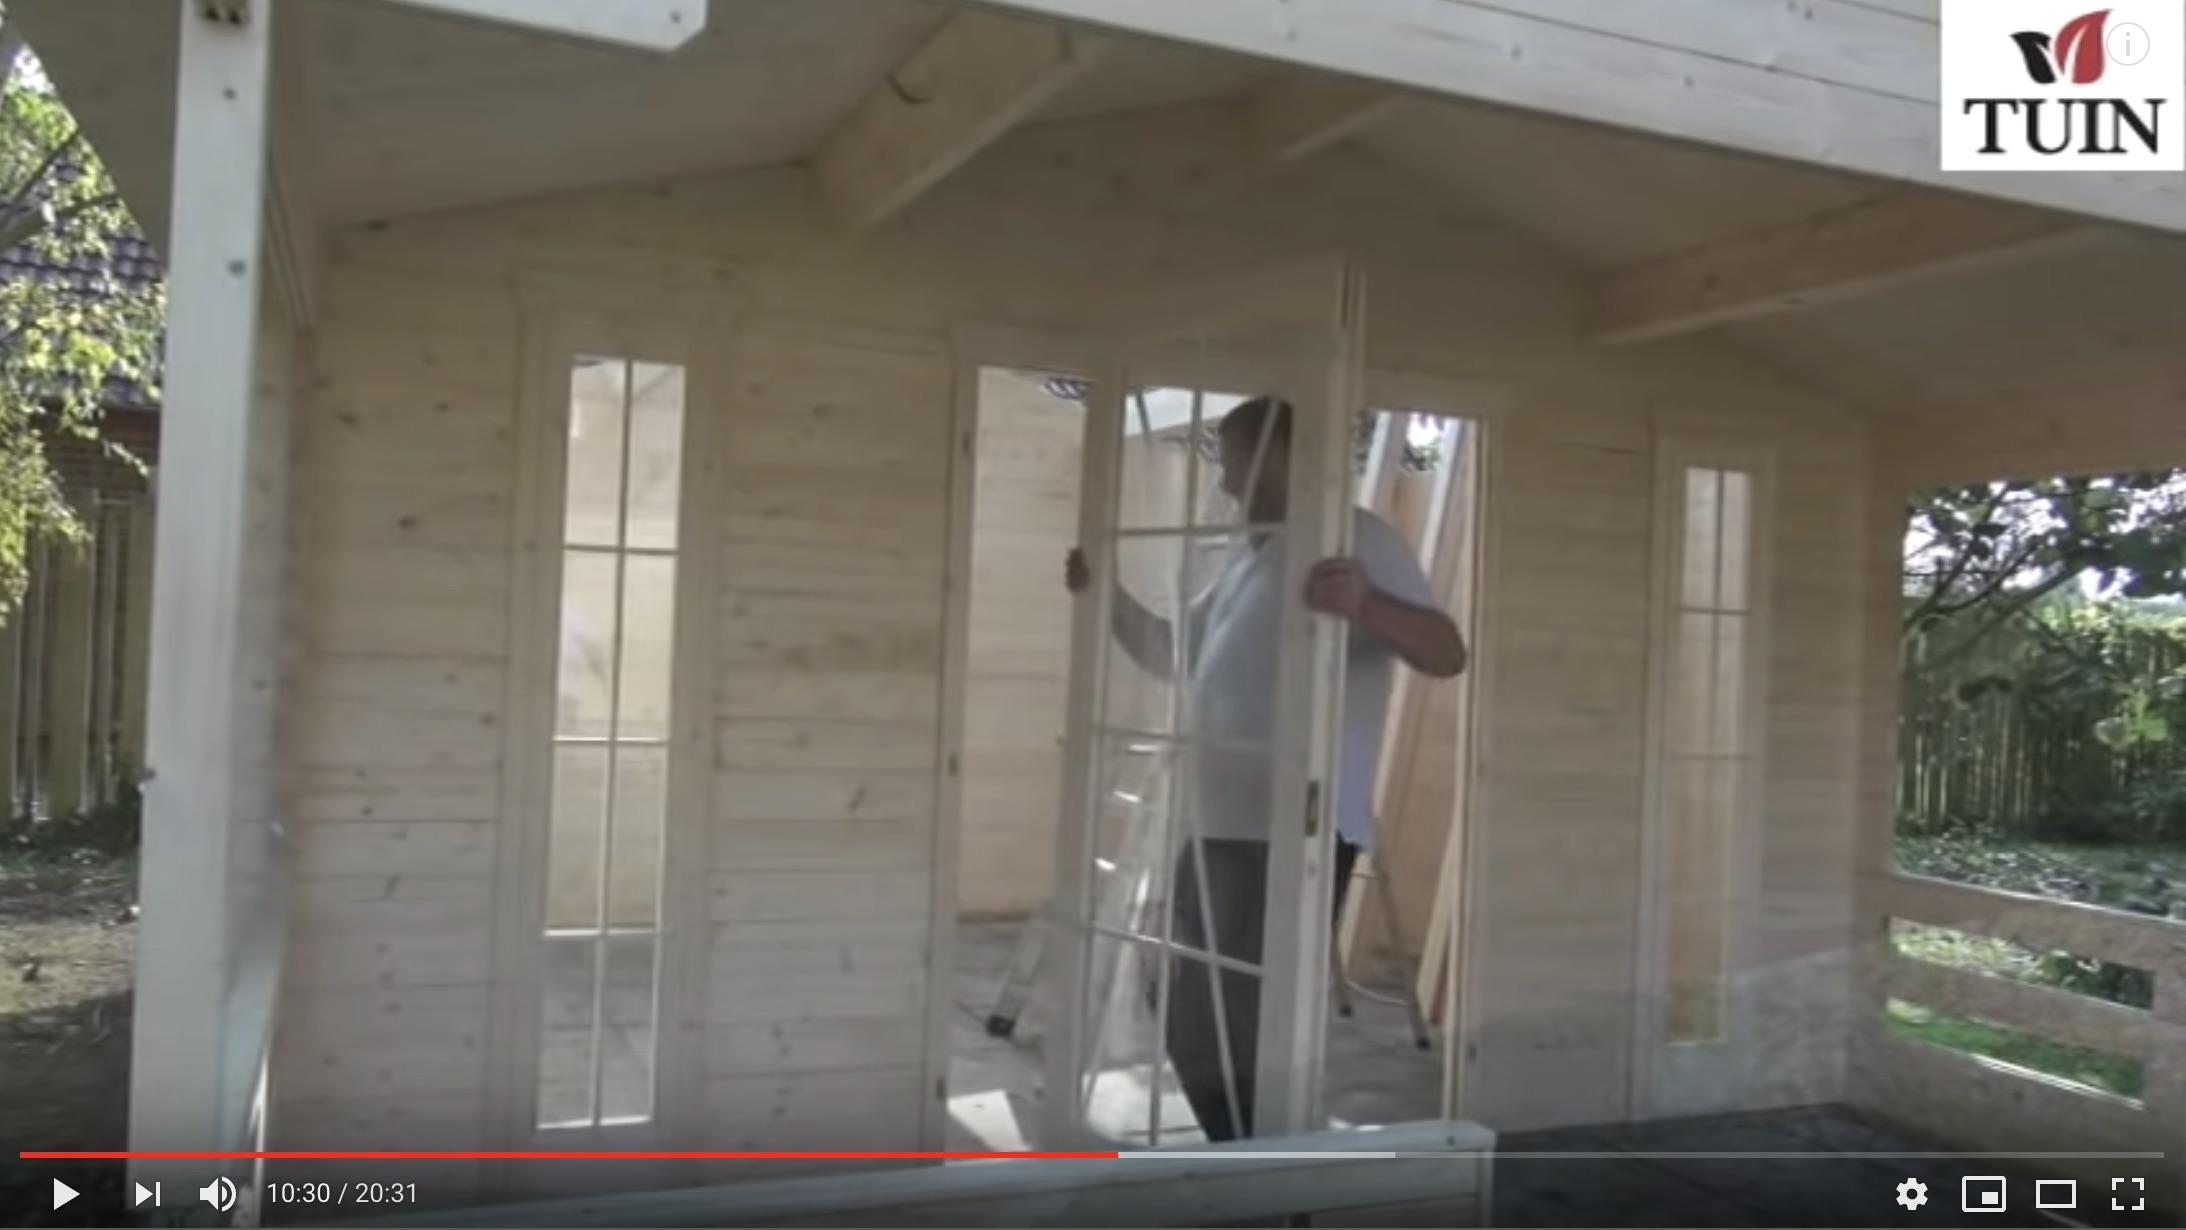 Log cabin fitting tips tuin tuindeco